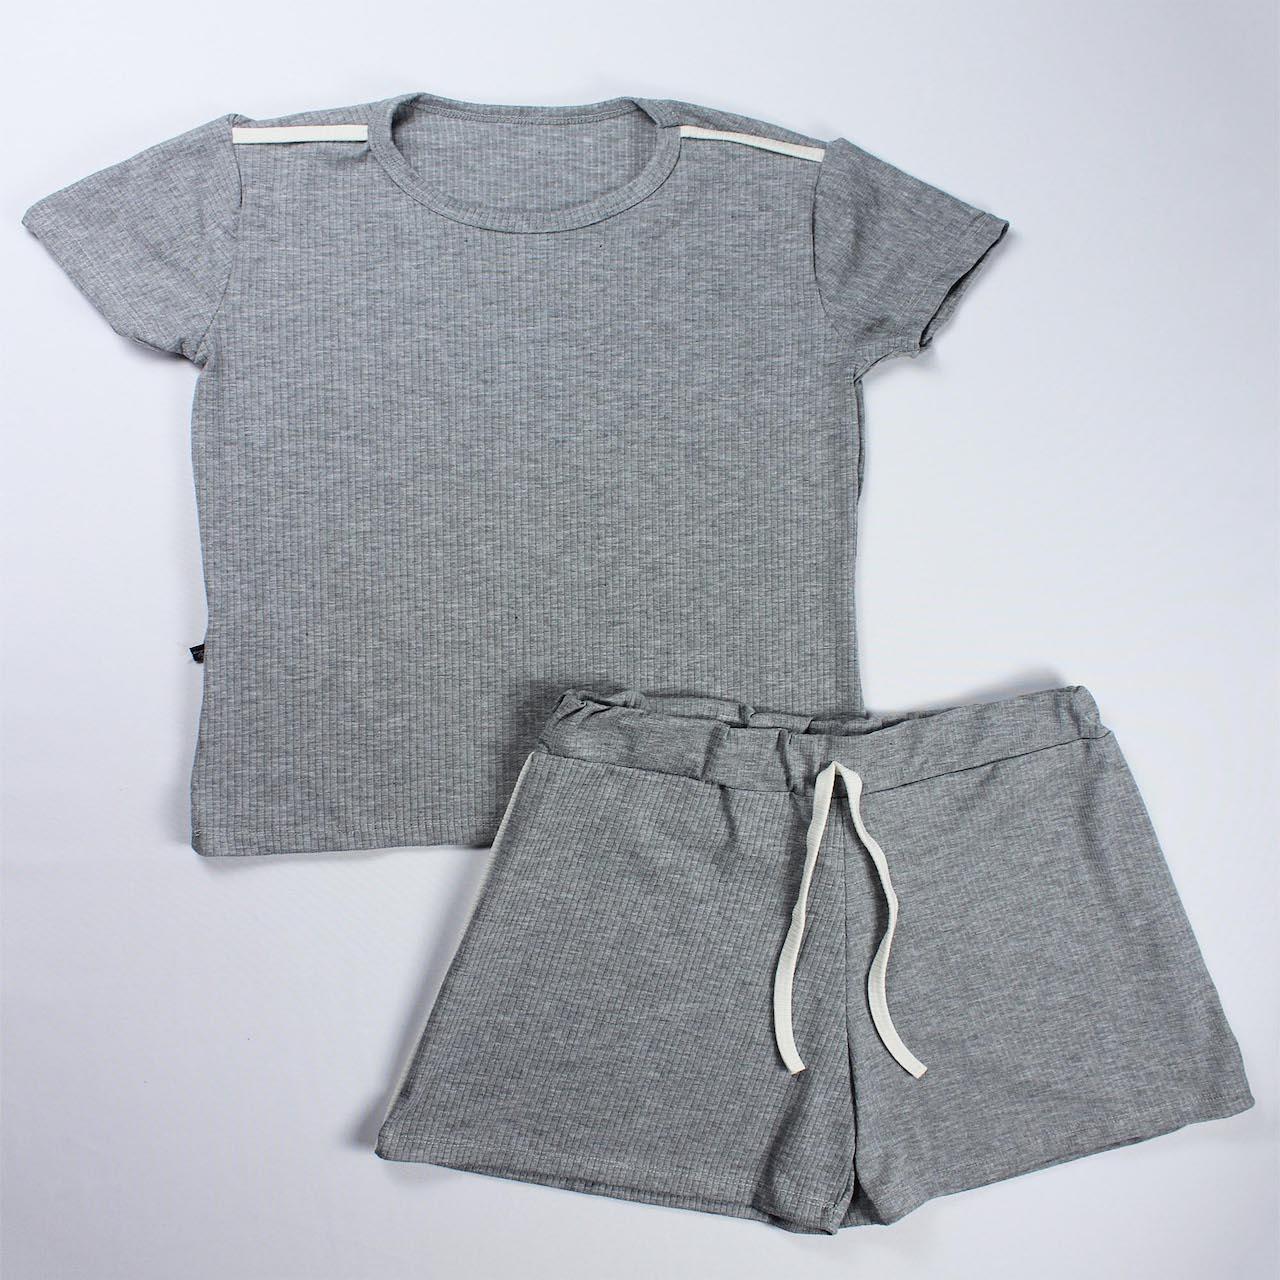 Conjunto Blusa e Short Detalhe Faixa Feminino -  Cinza Claro